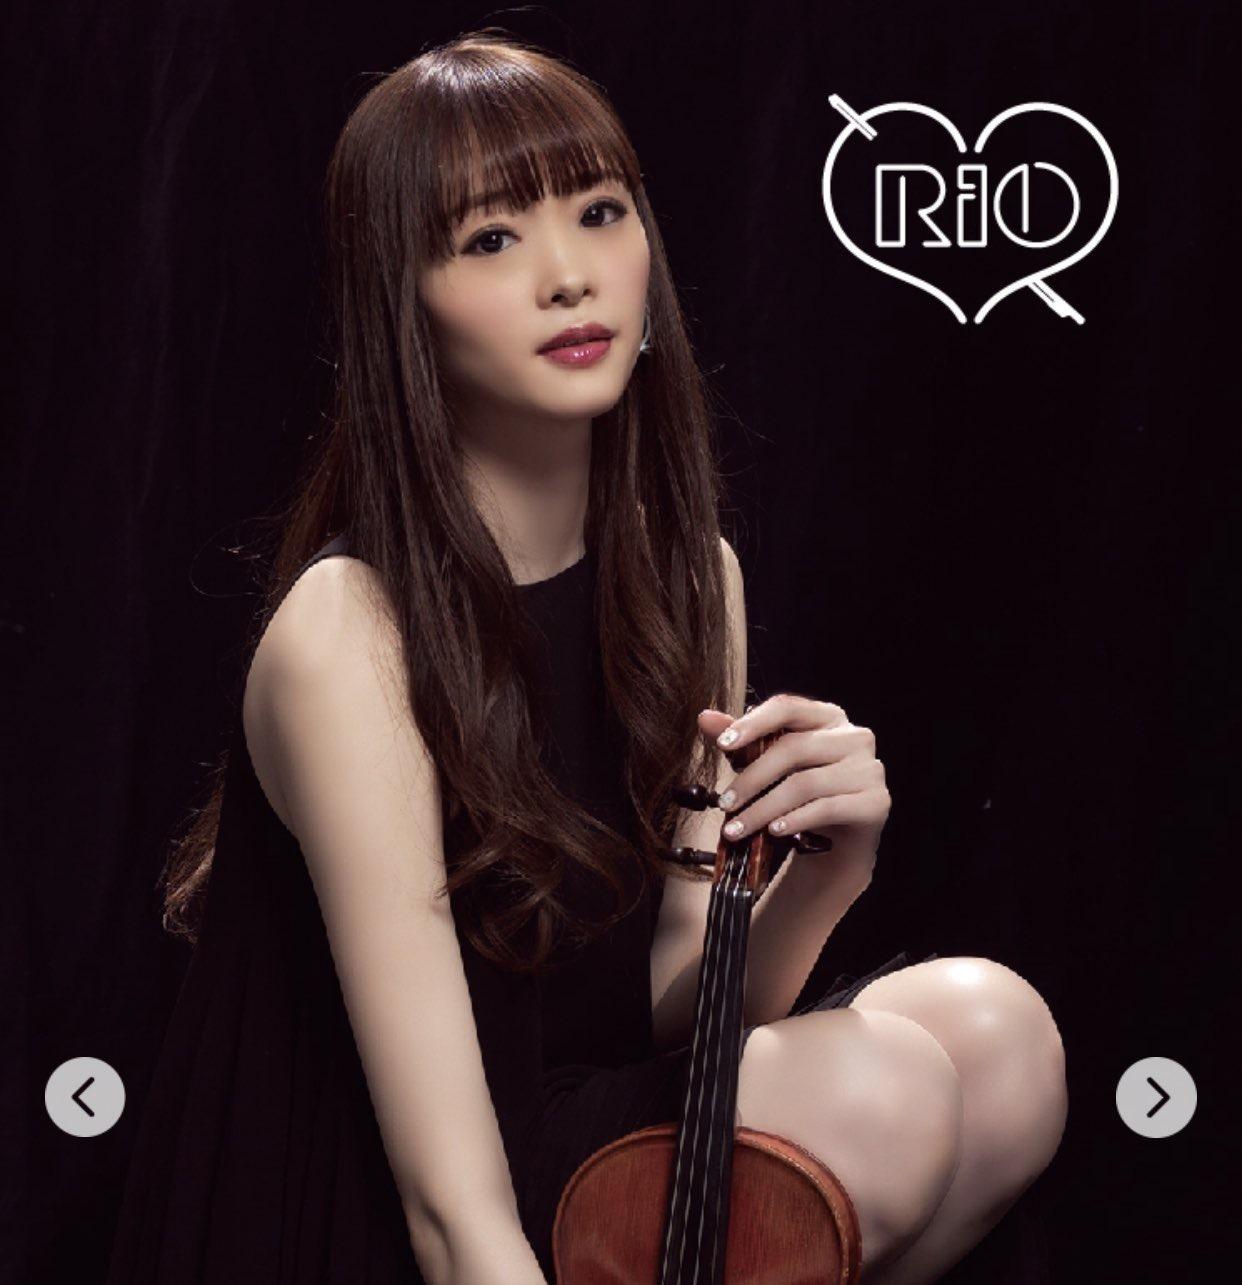 【4/13(土)】RY's・RIO卒業公演前夜祭・夜の部・RY'son CLASSIC